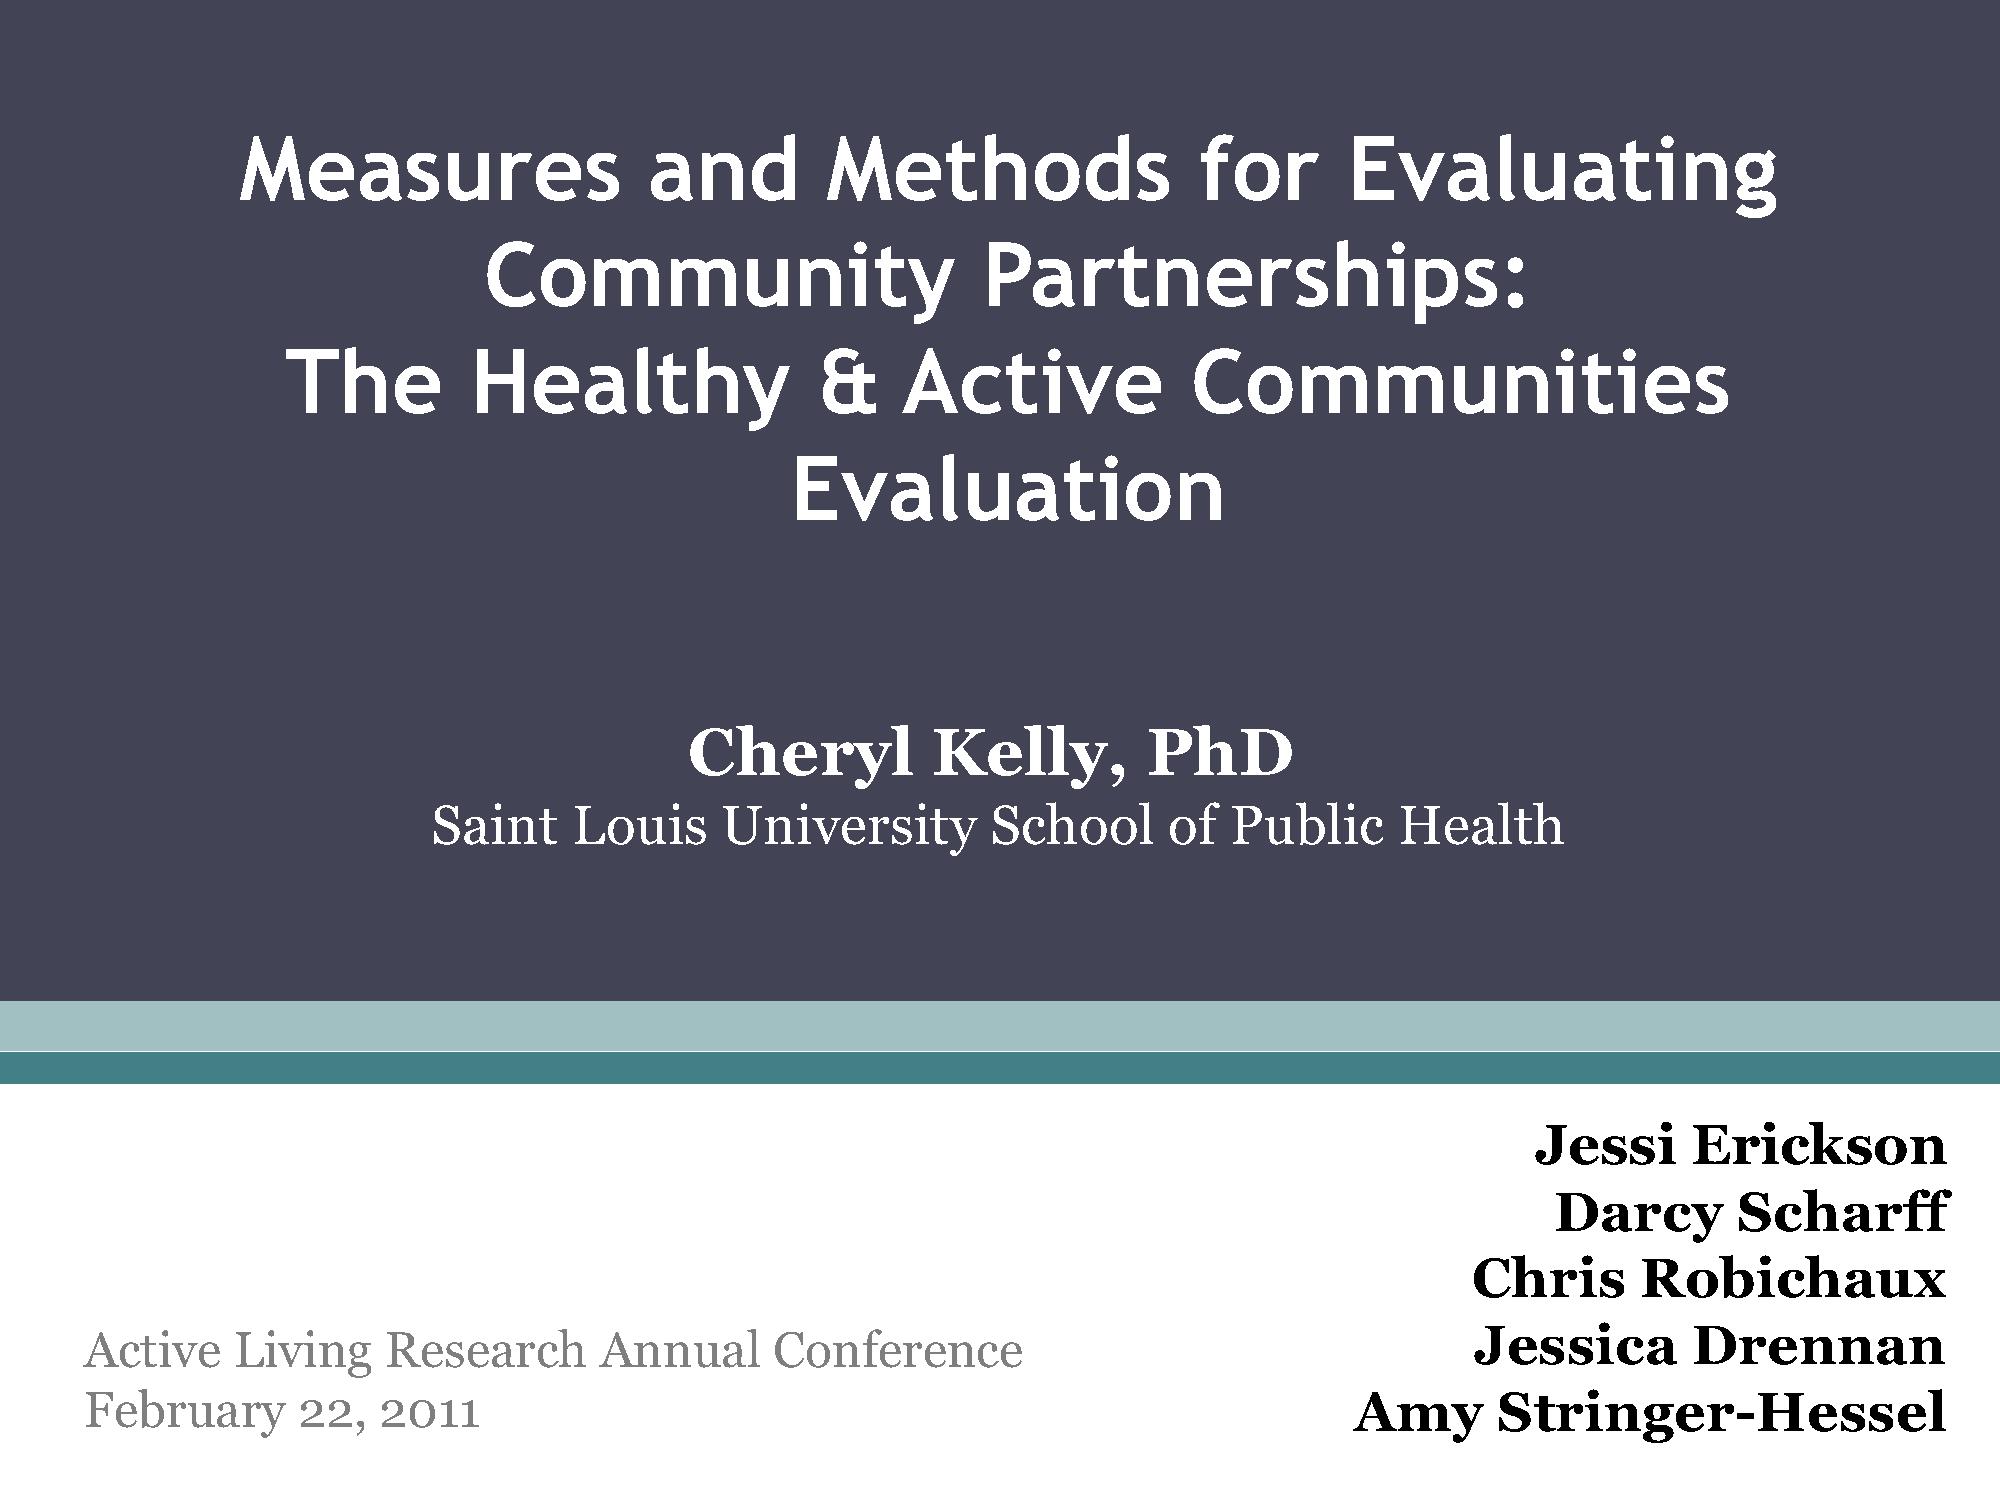 Evaluating Community Partnerships ALR Presentation 2011